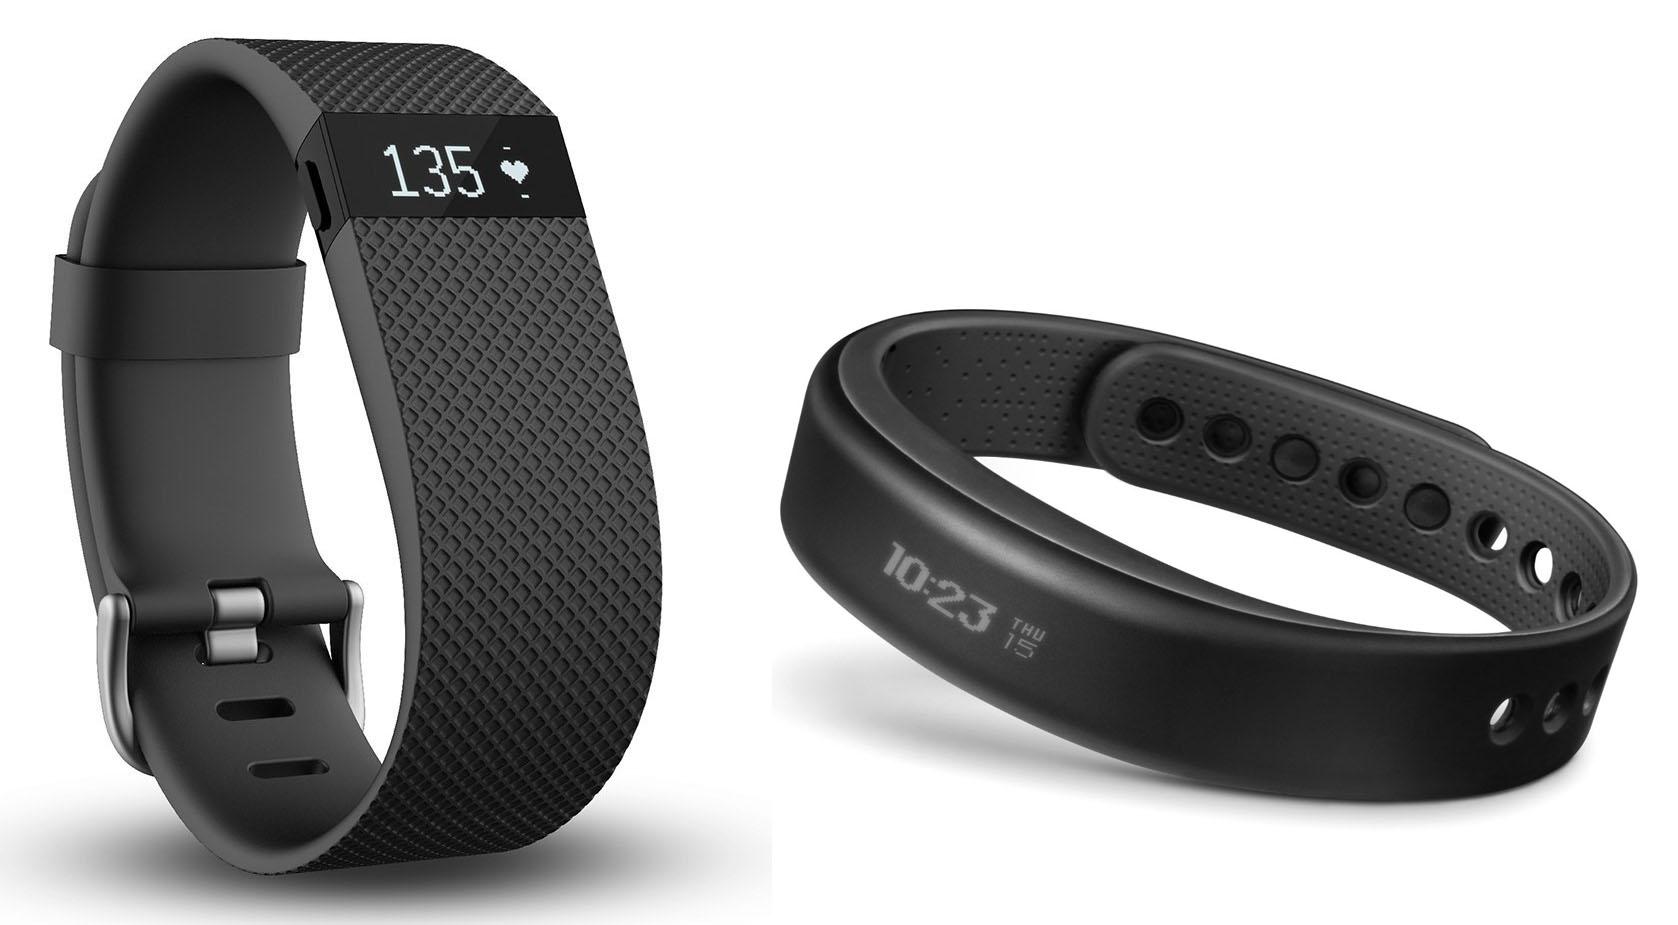 garmin, fitness tracker, fitness tracker comparison, fitbit